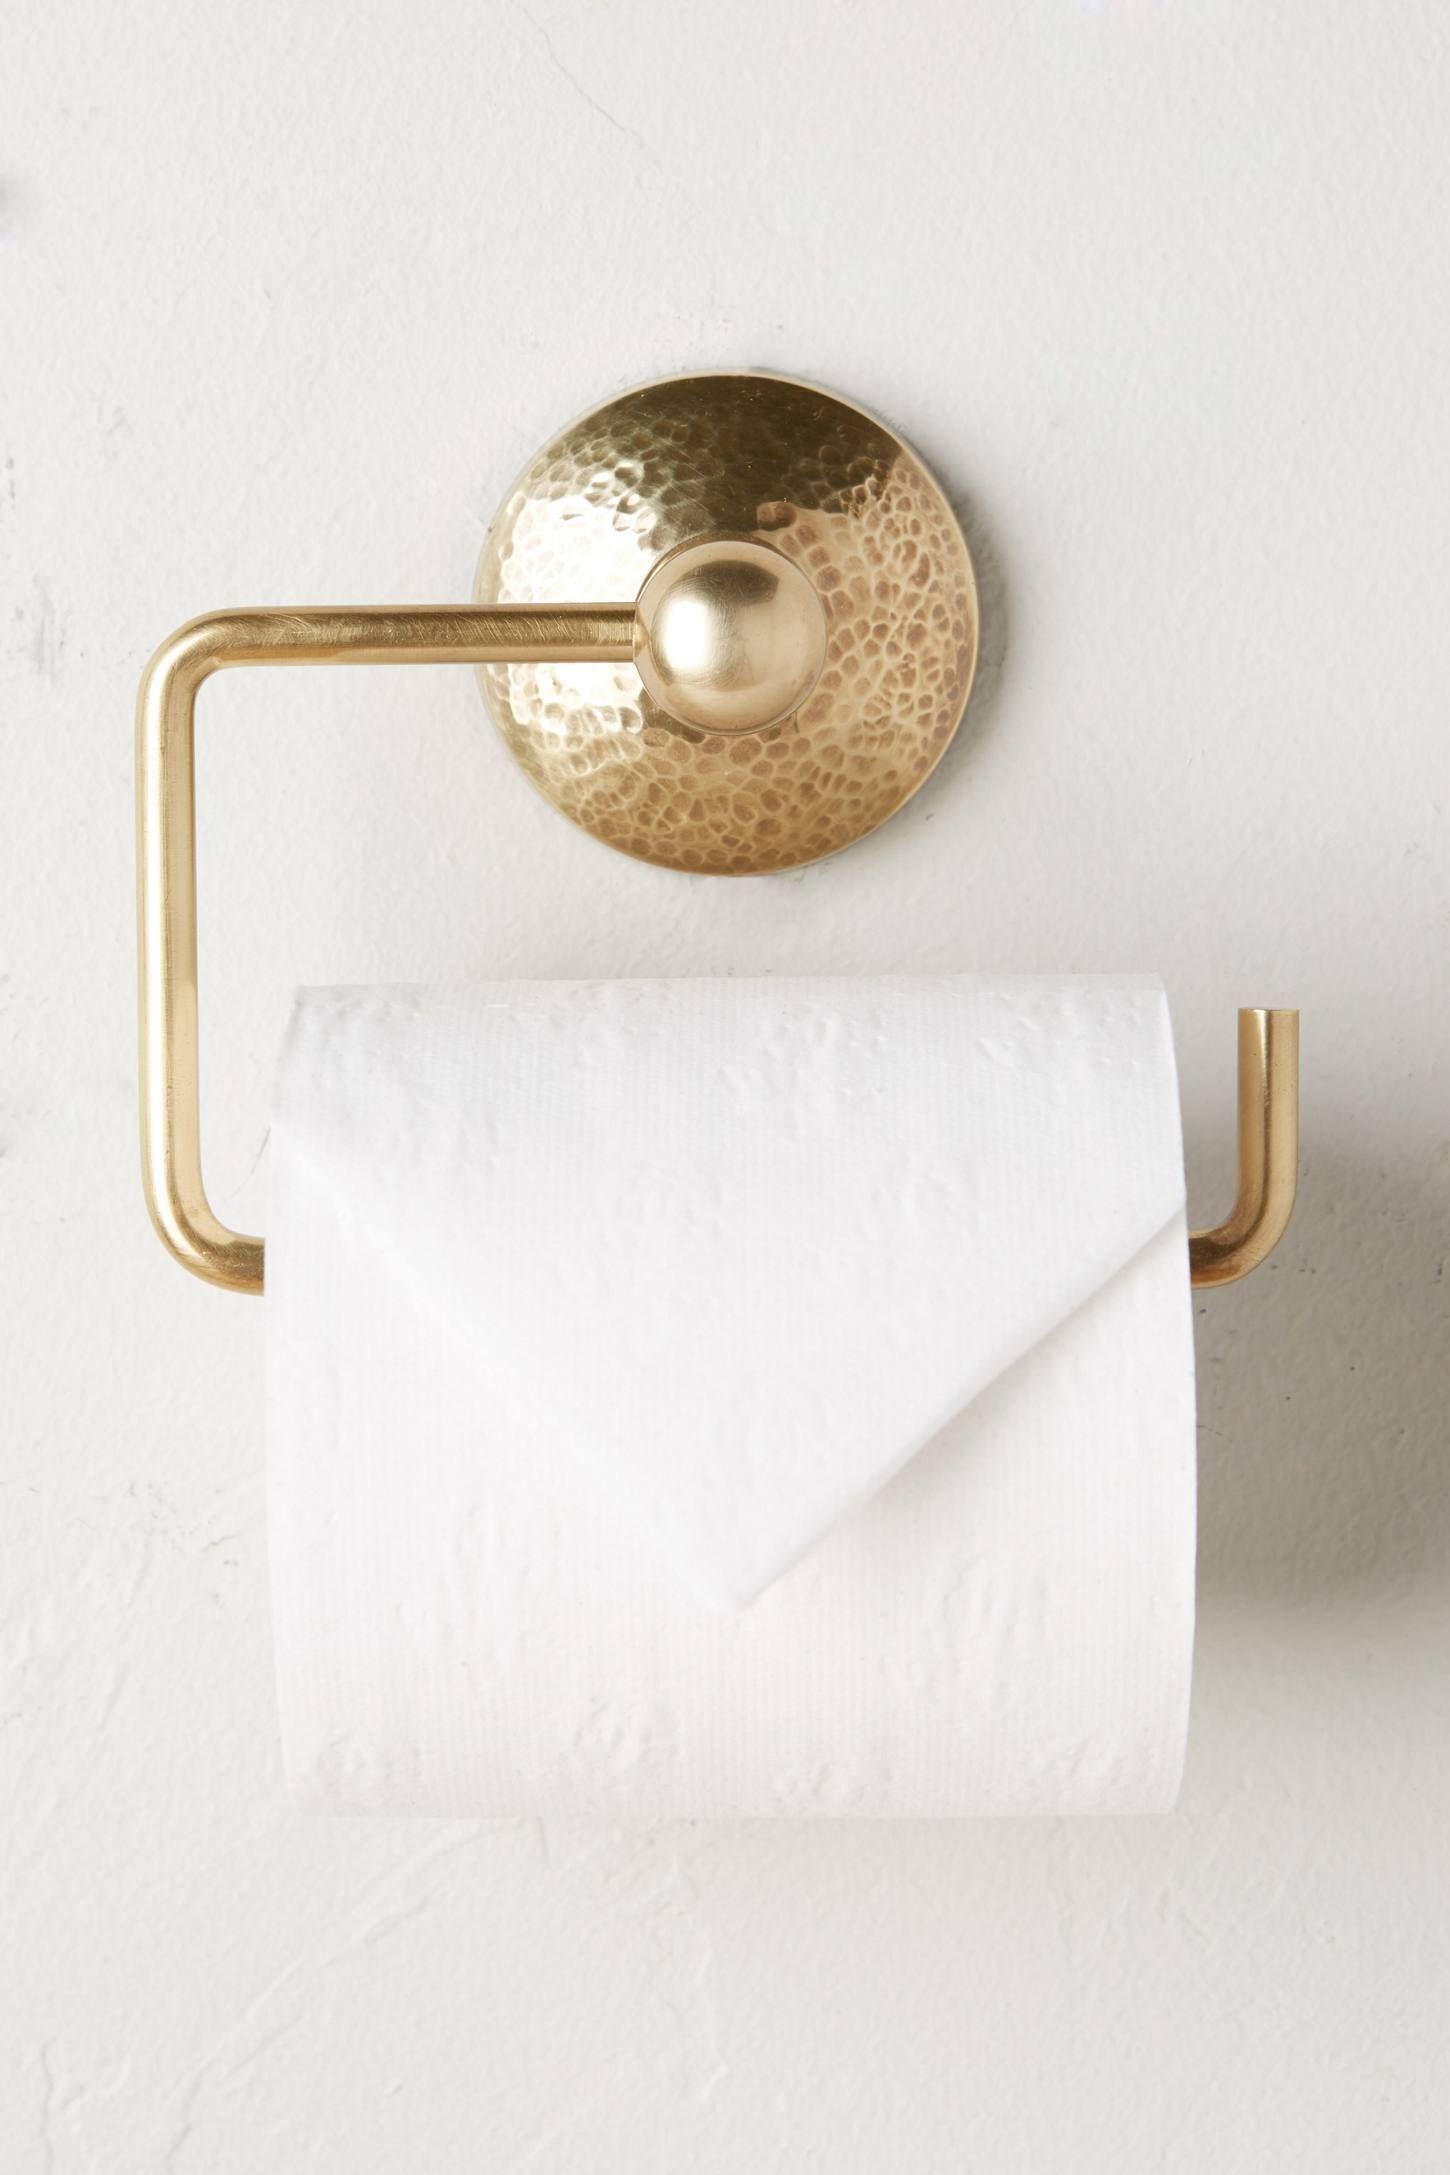 Hammered Toilet Paper Holder Brass Toilet Paper Holder Toilet Paper Towel Holder Bathroom